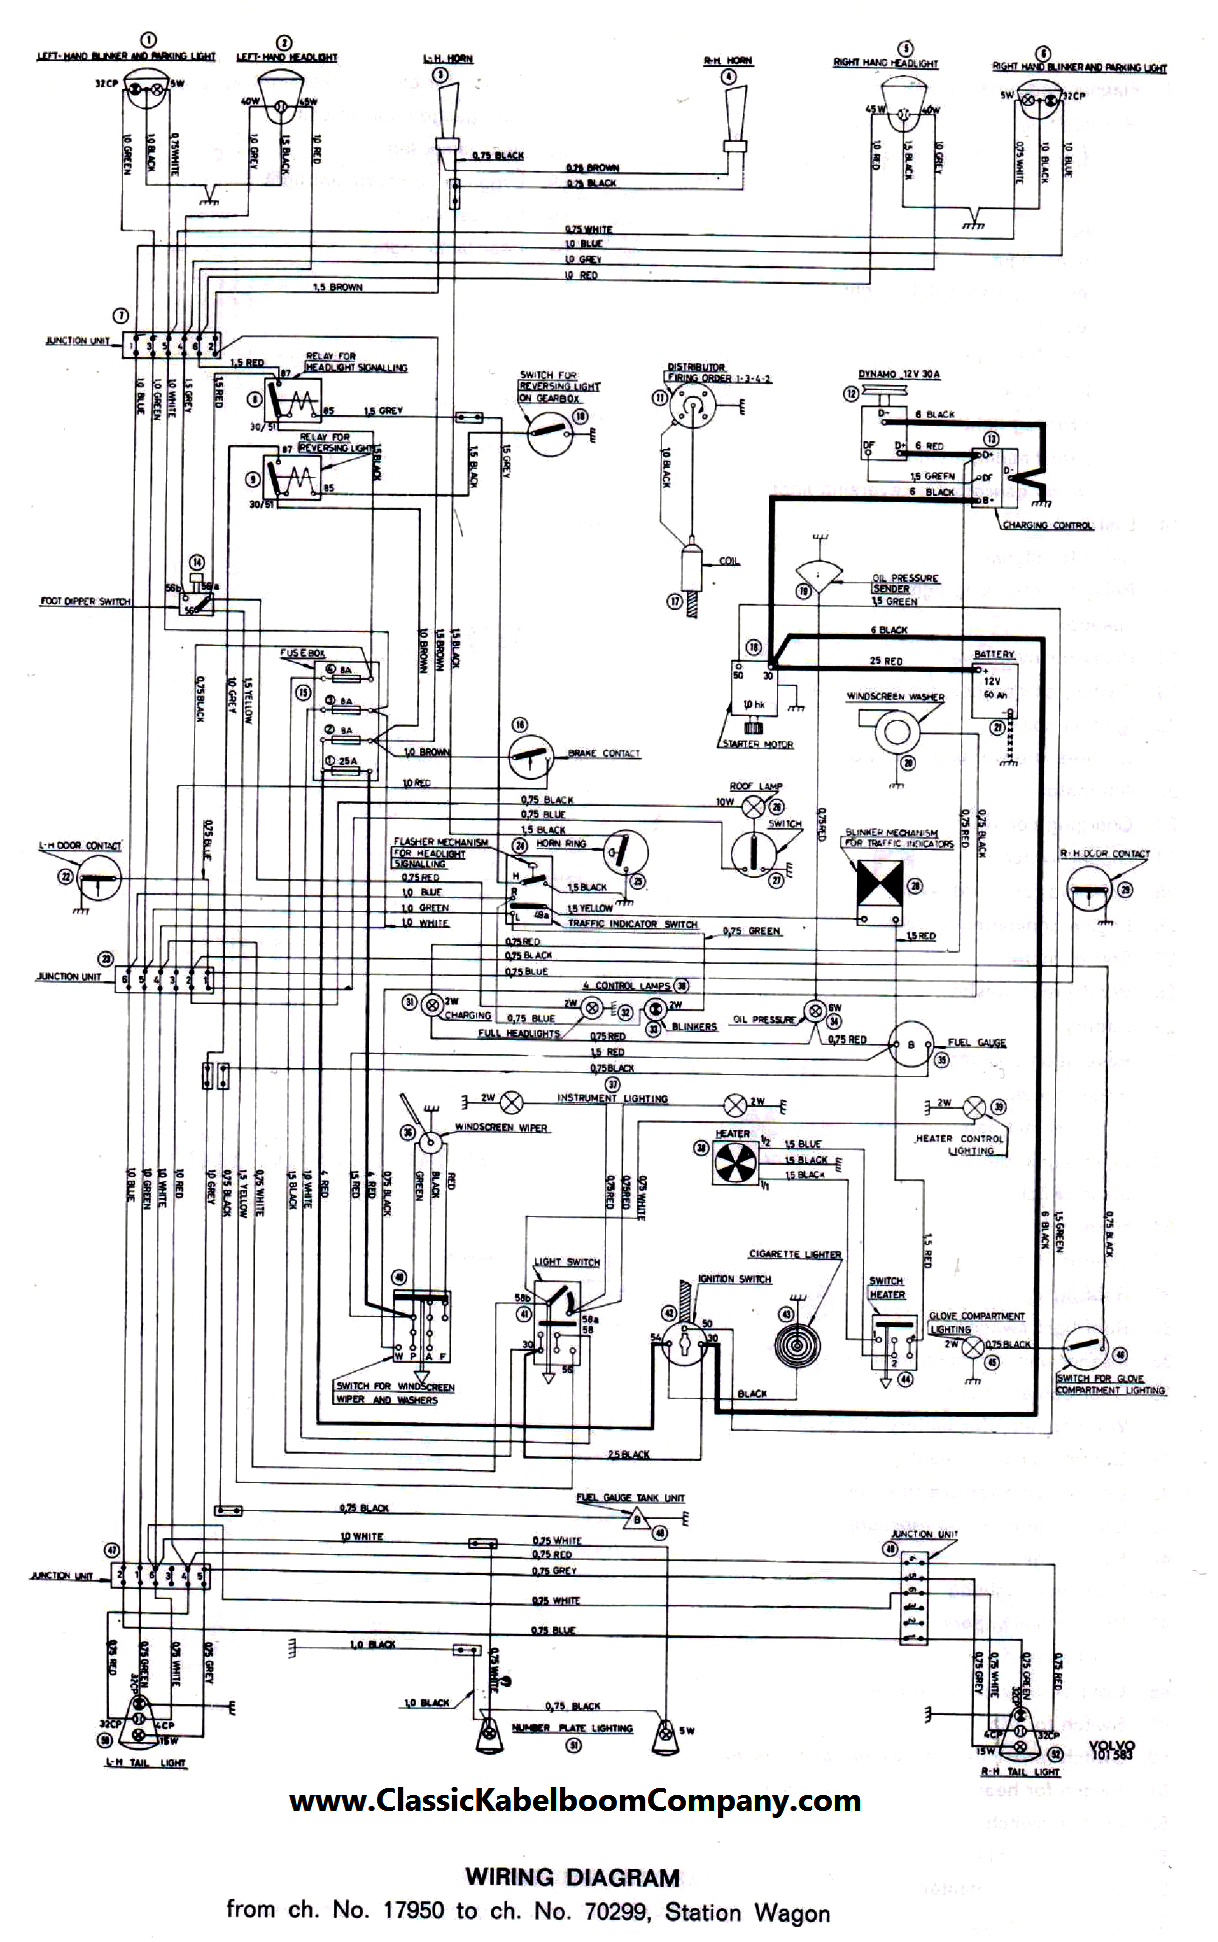 classic kabelboom company elektrisch bedrading schema volvo rh classickabelboomcompany com Volvo V70 Electrical Diagram Volvo 240 Fuse Diagram